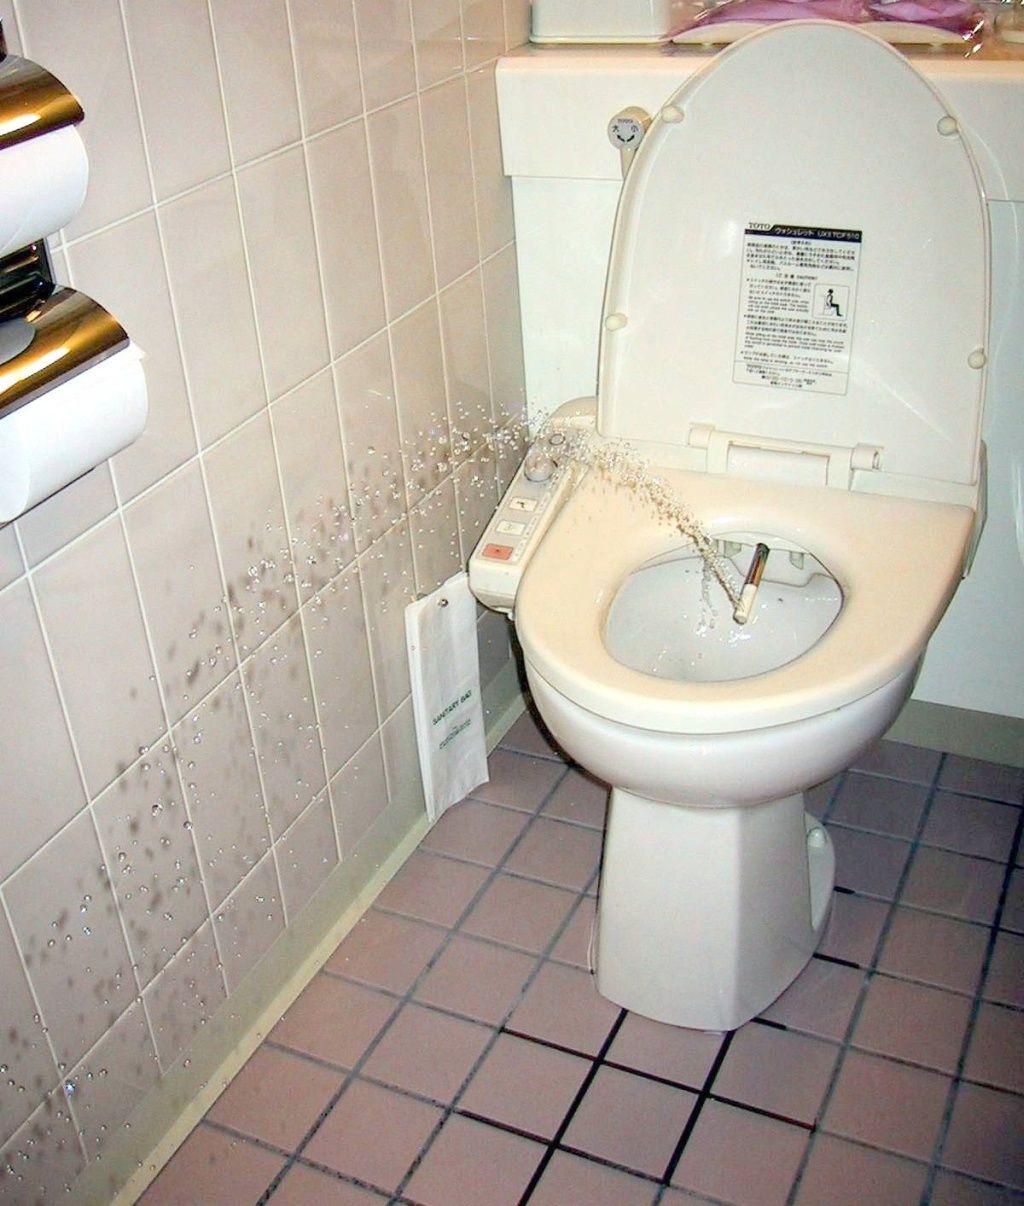 11 Fantastic Bathrooms In China Toilets In Japan Wikipedia In Ucwords Bathroom Bidet Toilet Japanese Toilet